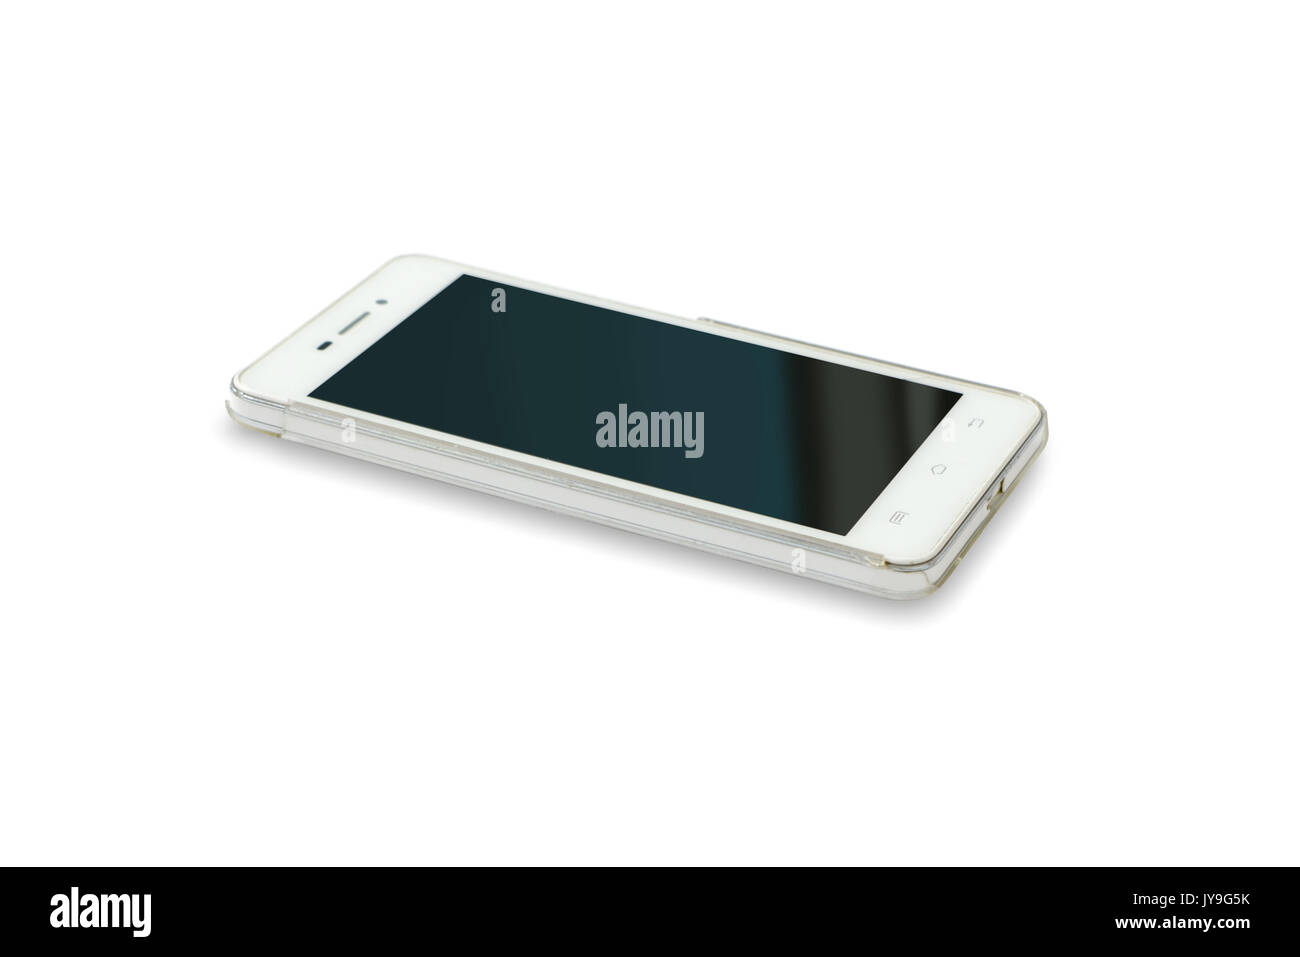 Smartphone Isolato Su Sfondo Biancotelefono Cellulare Su Sfondo